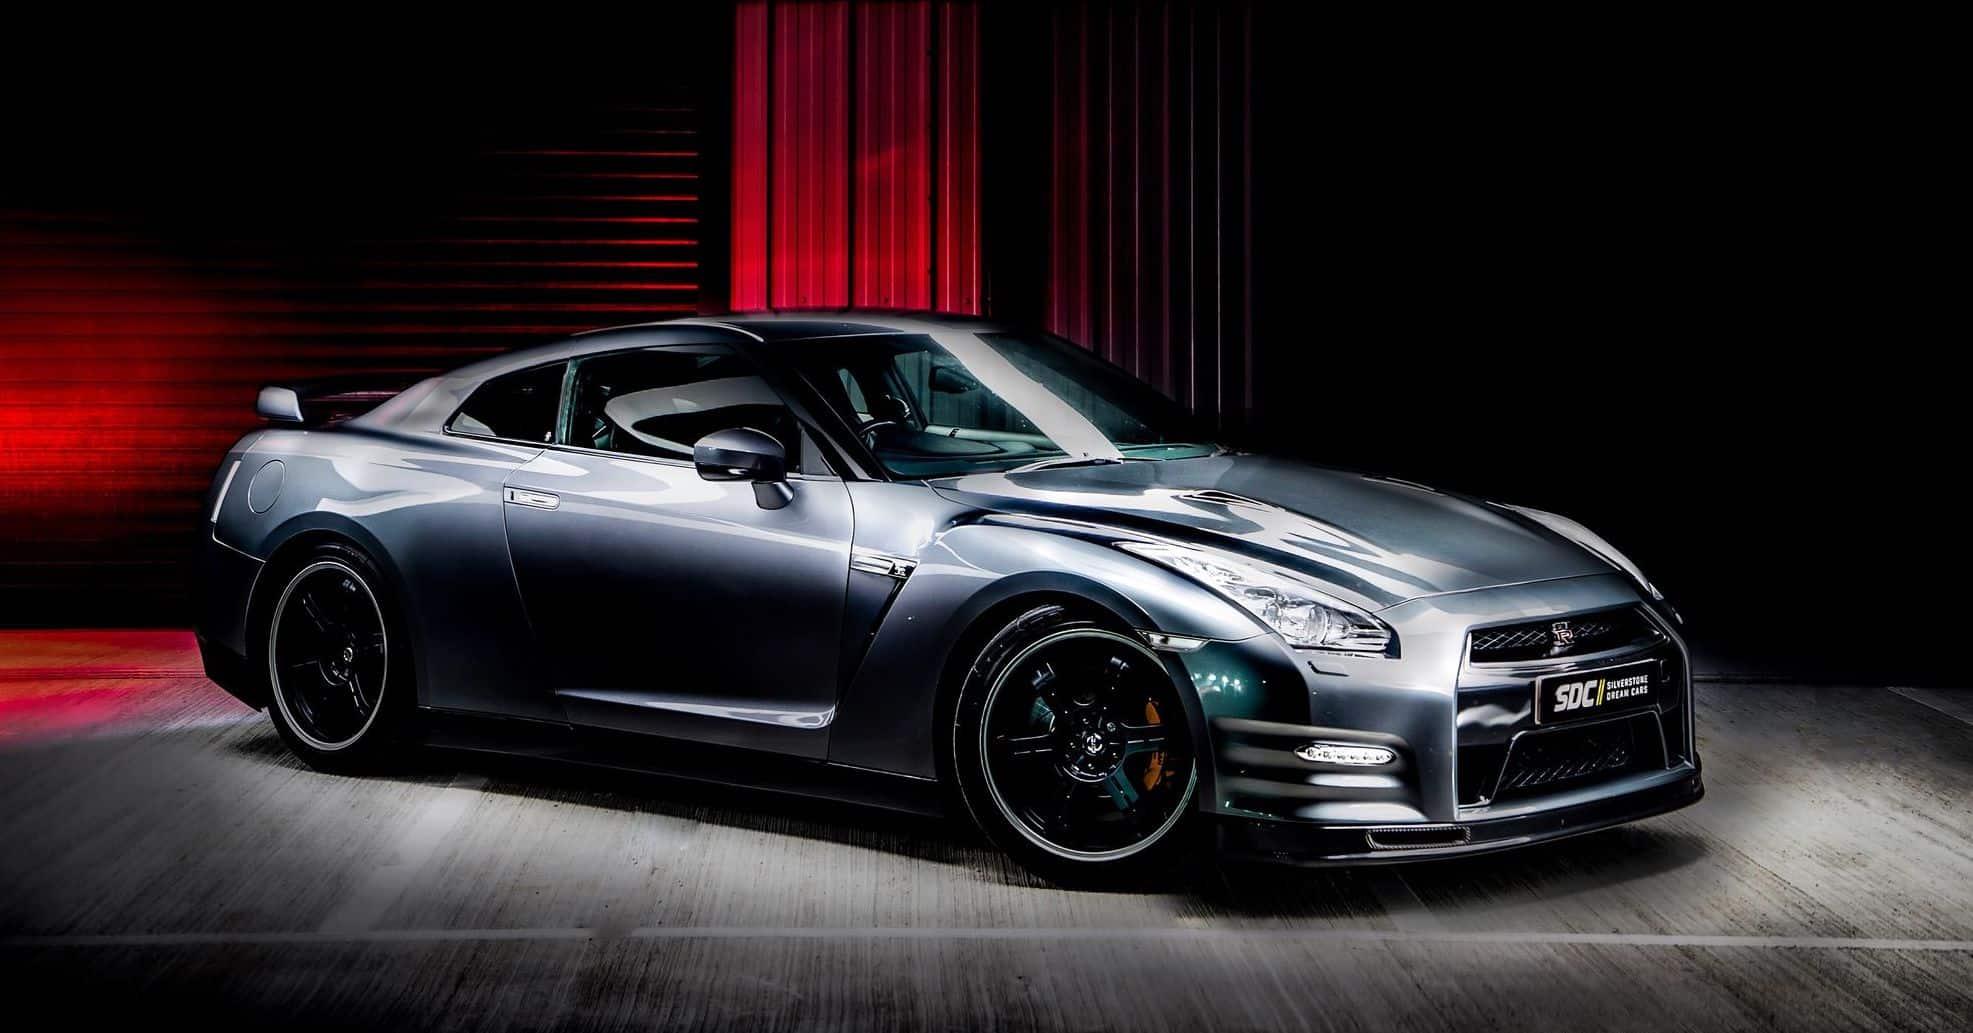 Nissan GTR – Special 'Track Edition' Model + £4,000!